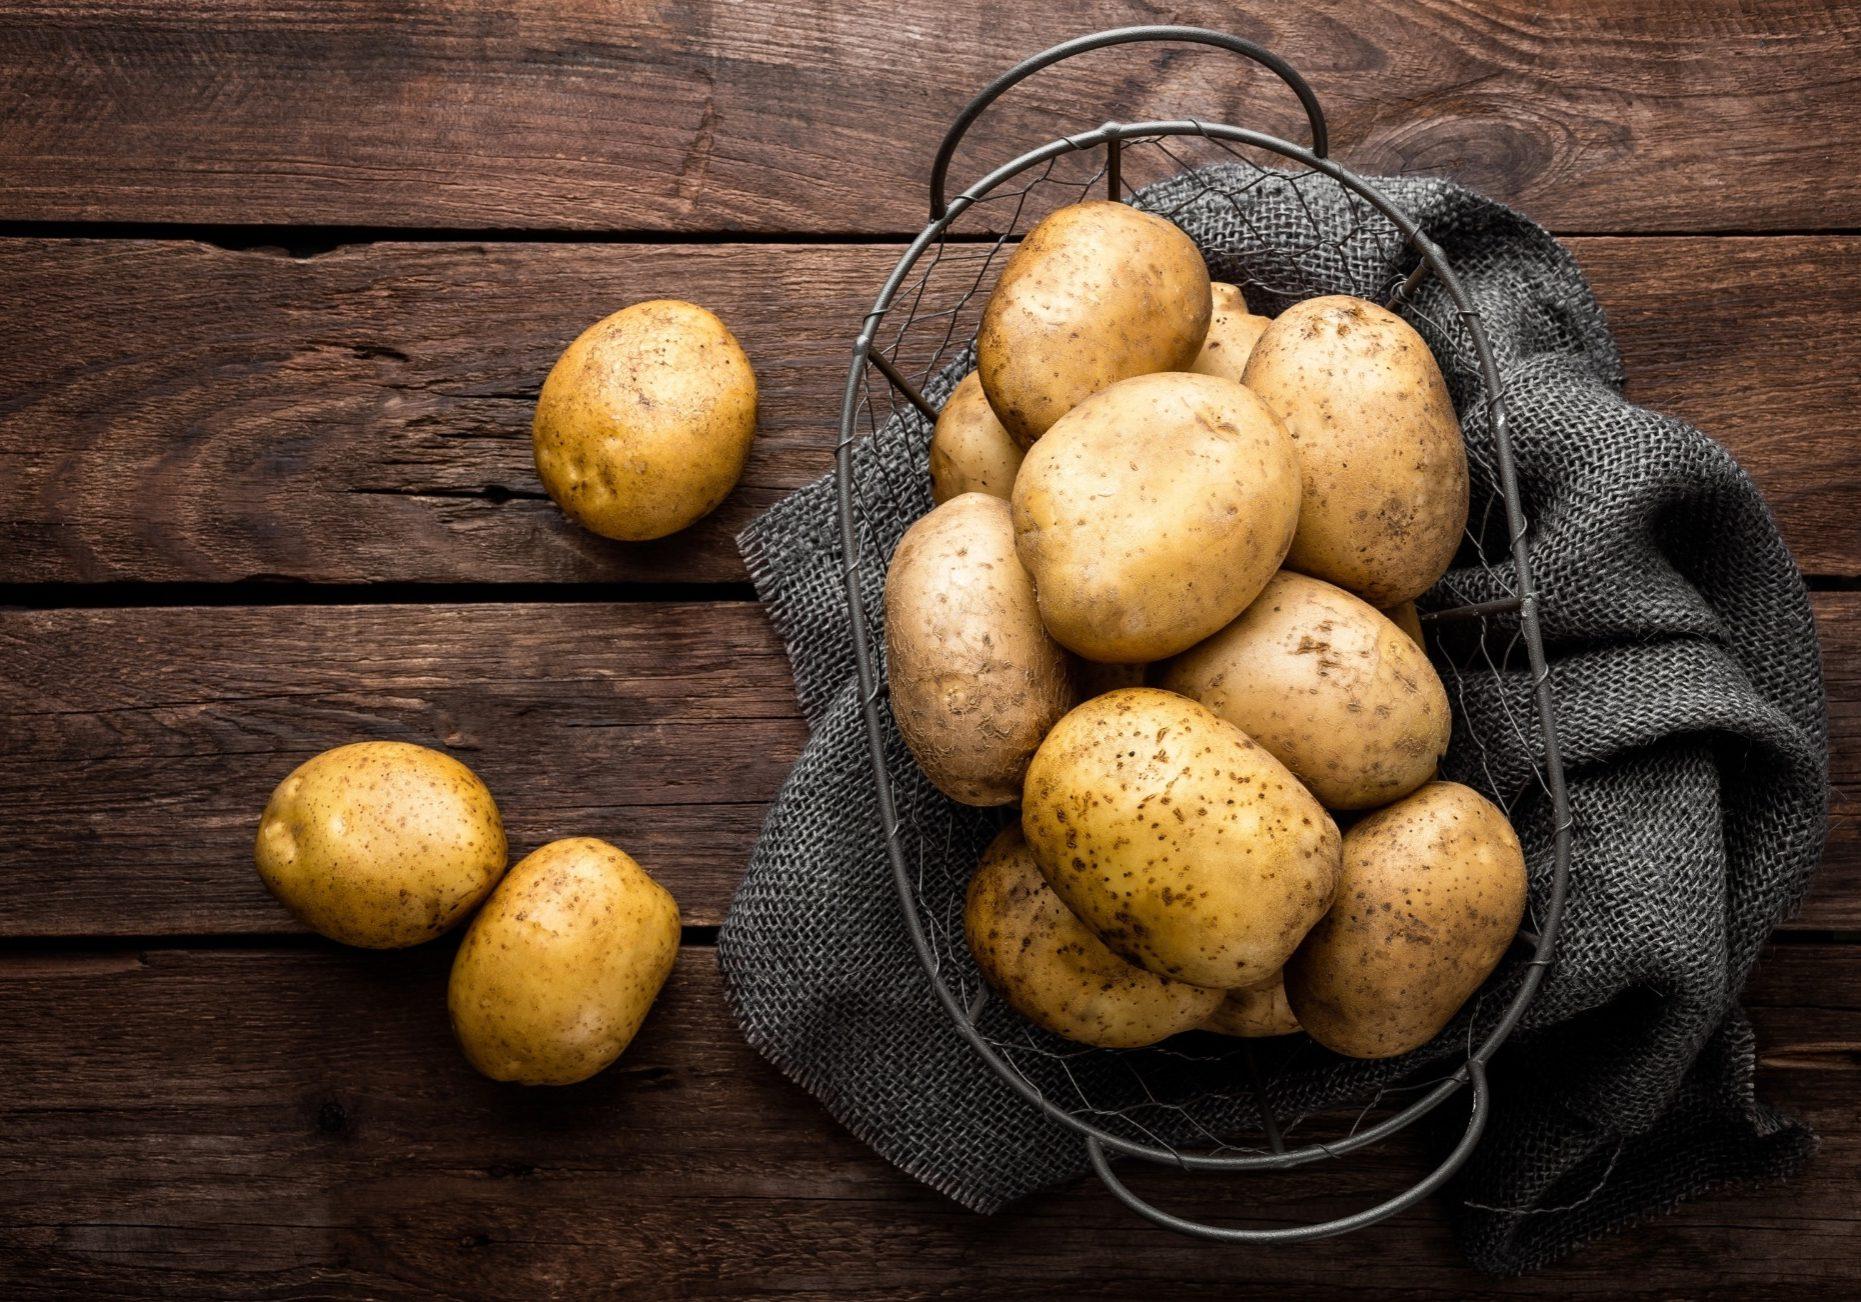 Willow Creek potato